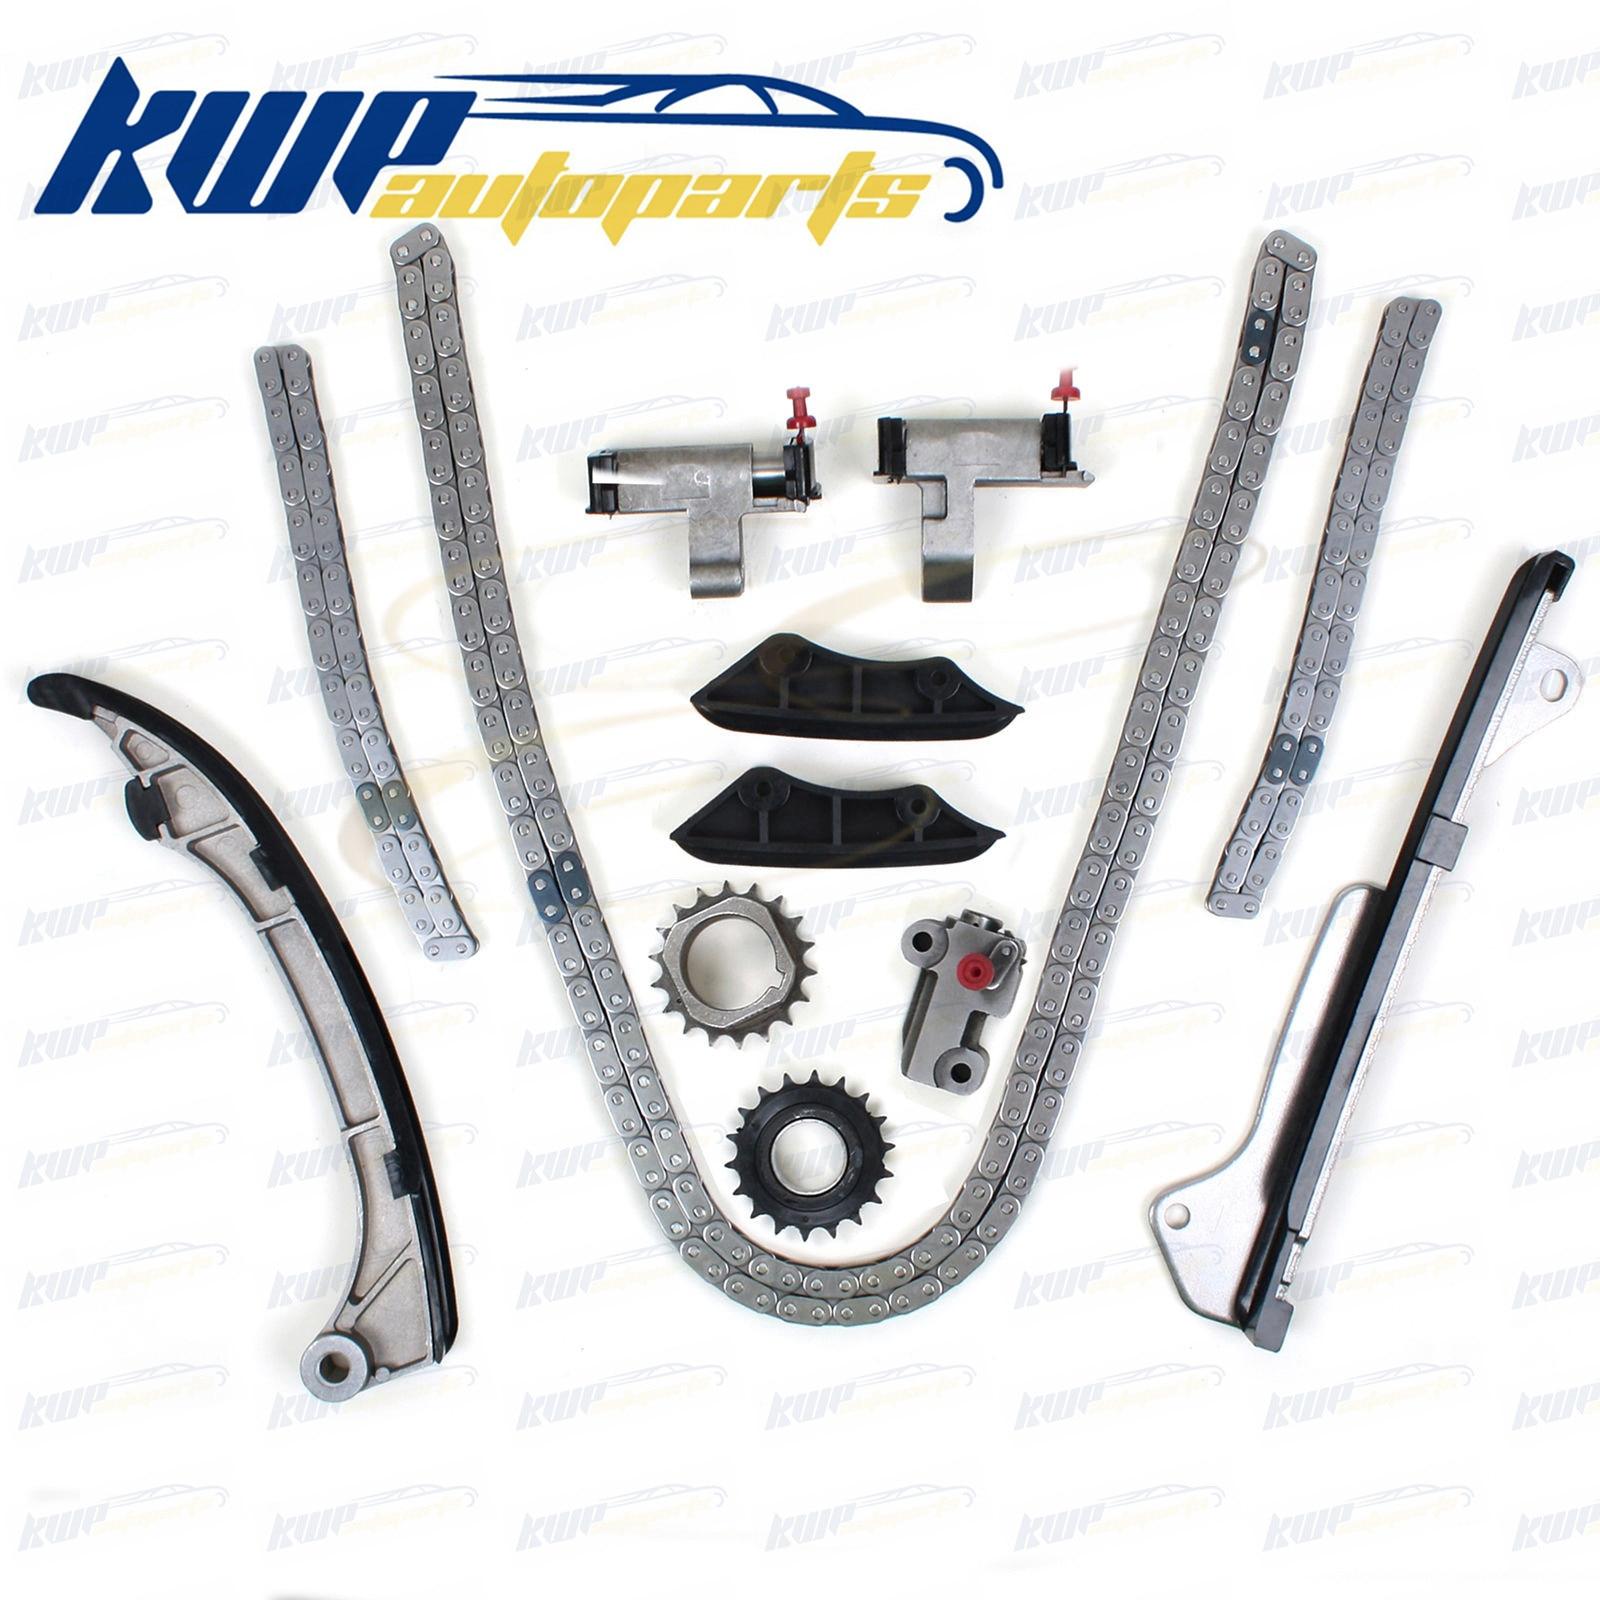 Online Shop Engine Water Pump For Bmw E39 E46 E36 E34 325i 328i 525i Timing Belt Chain Kit Toyota Camry Sienna Lexus V6 05 10 35l 2grfe 2grfse